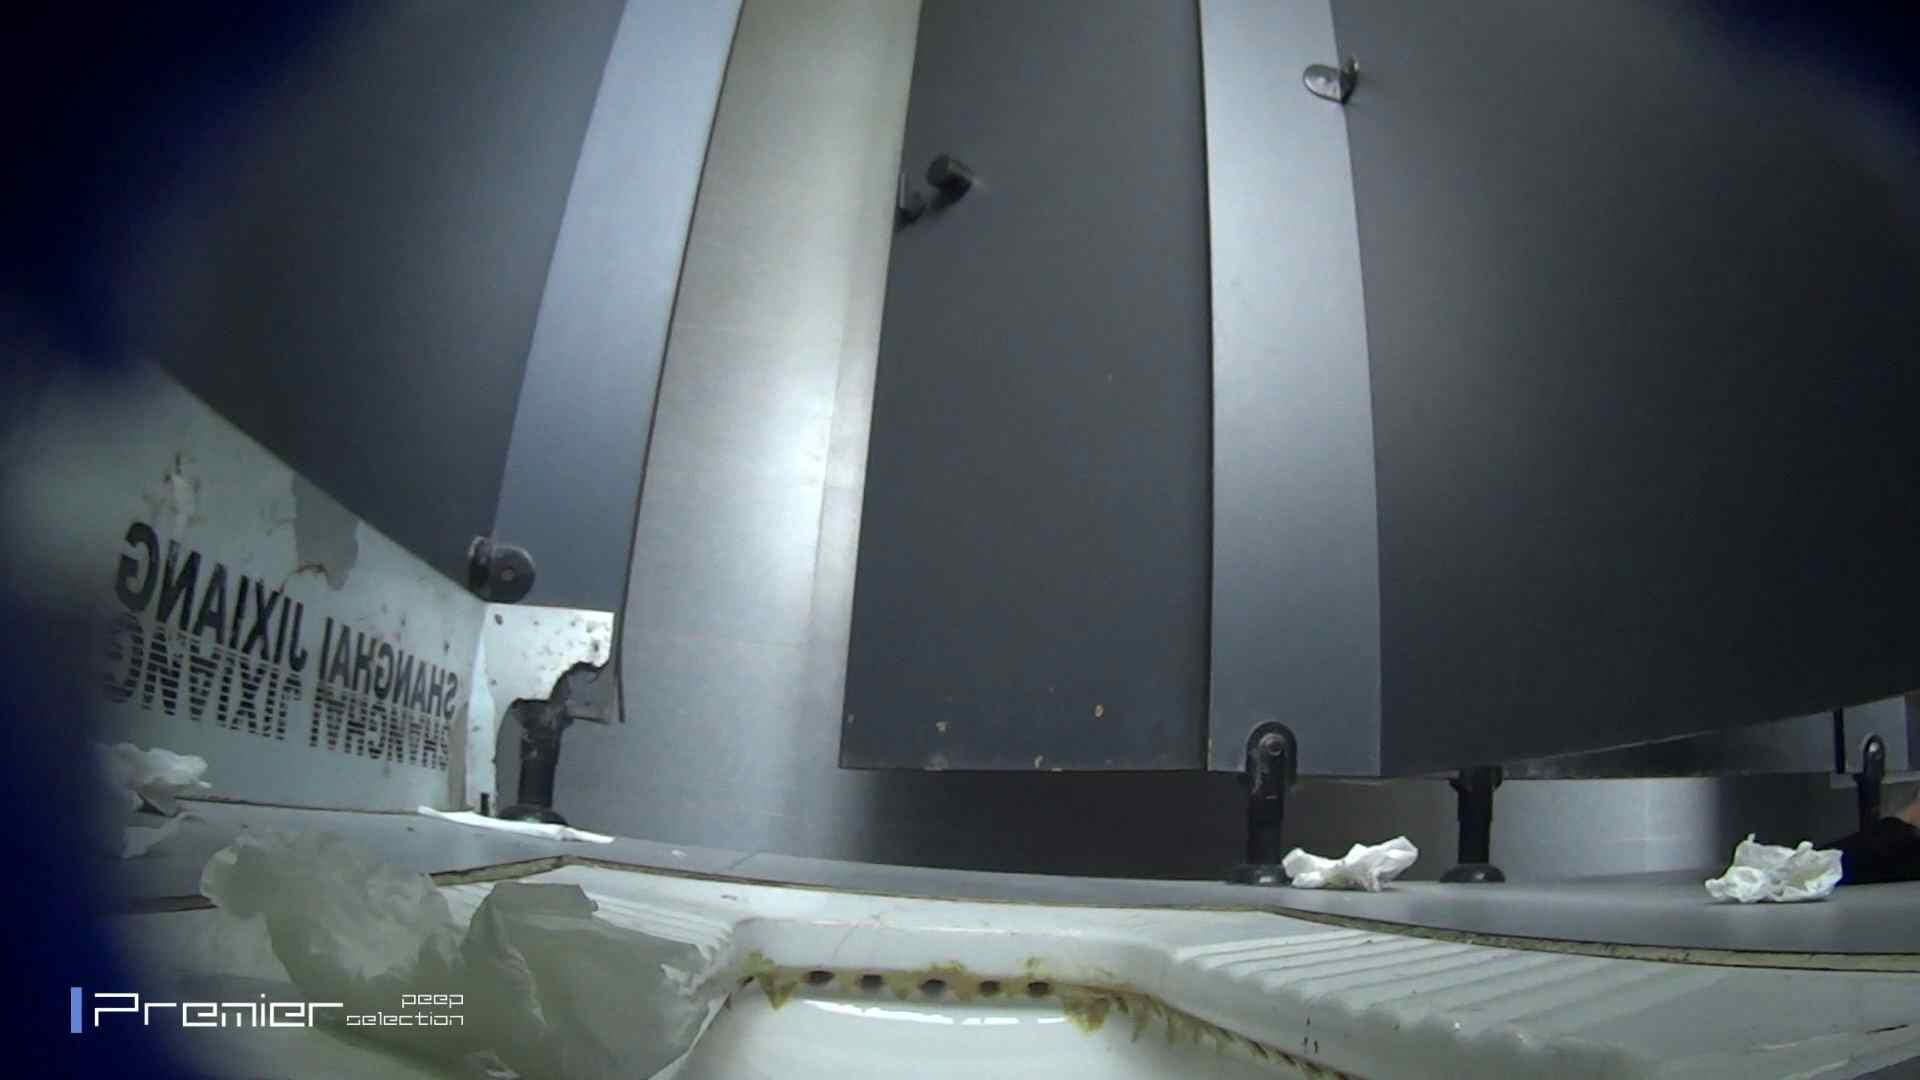 聖水ダラダラ色美女の洗面所 大学休憩時間の洗面所事情55 洗面所  55PIX 24